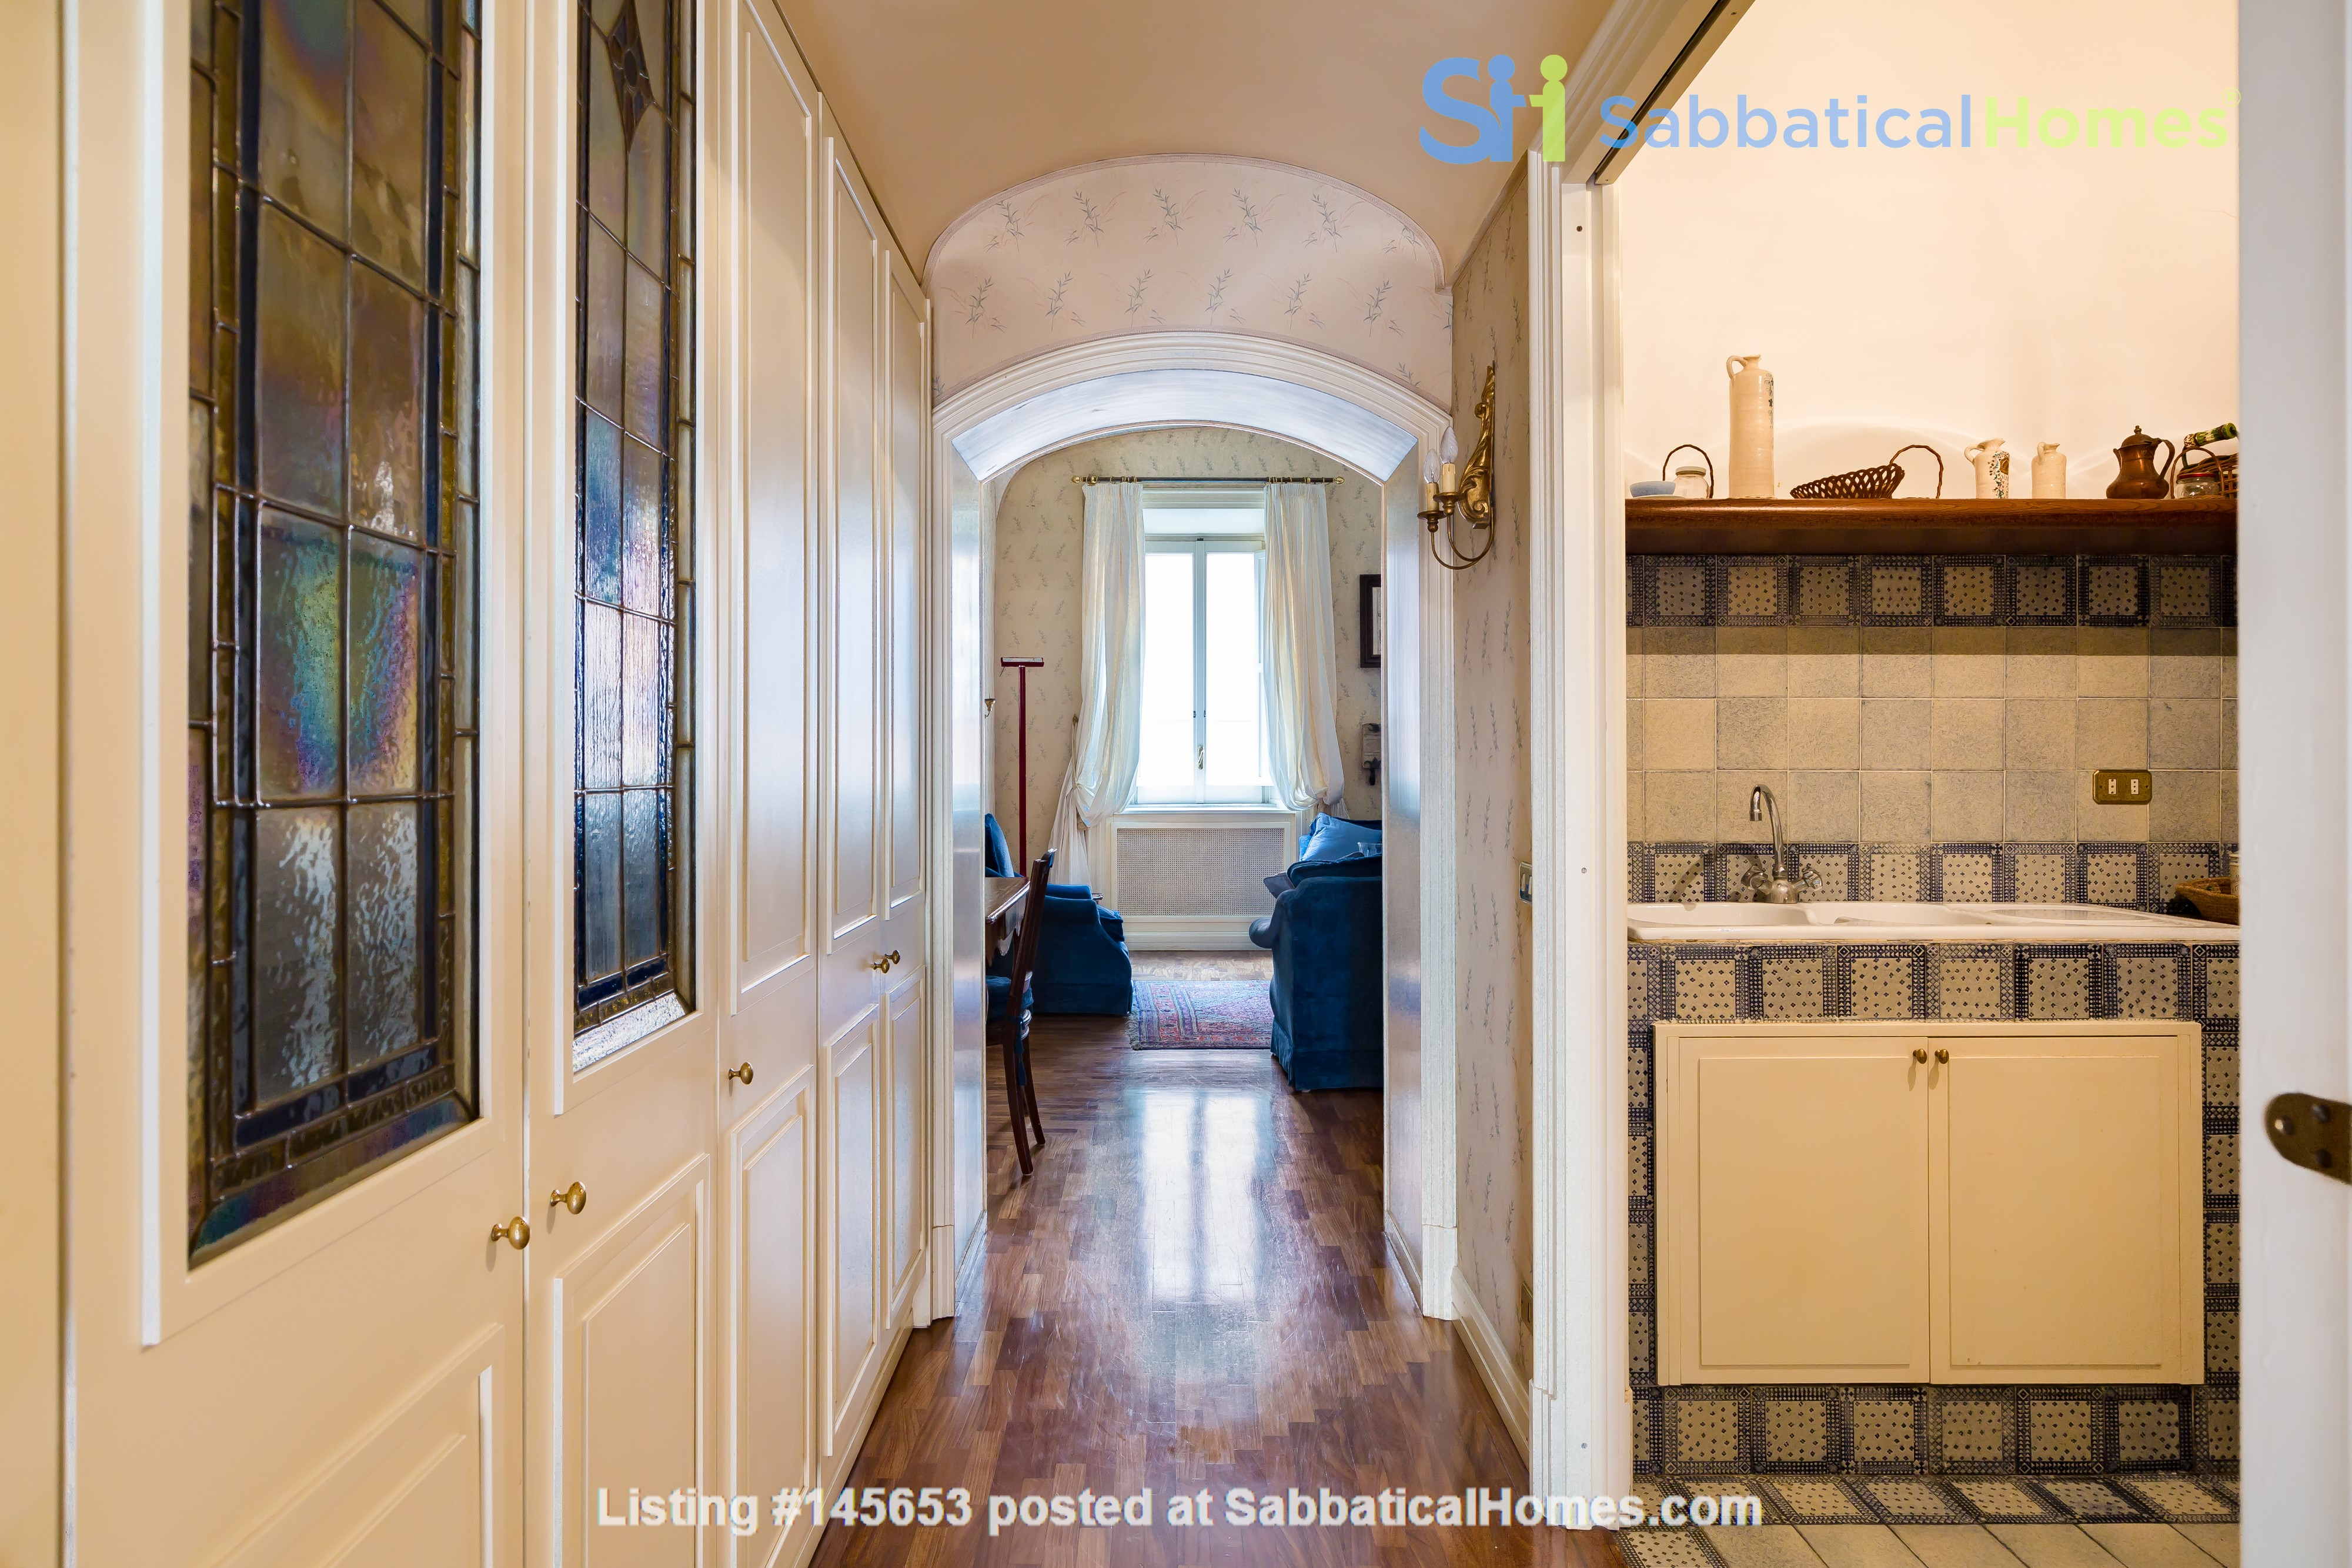 EMMA SPAGNA APARTMENT Home Rental in Roma, Lazio, Italy 2